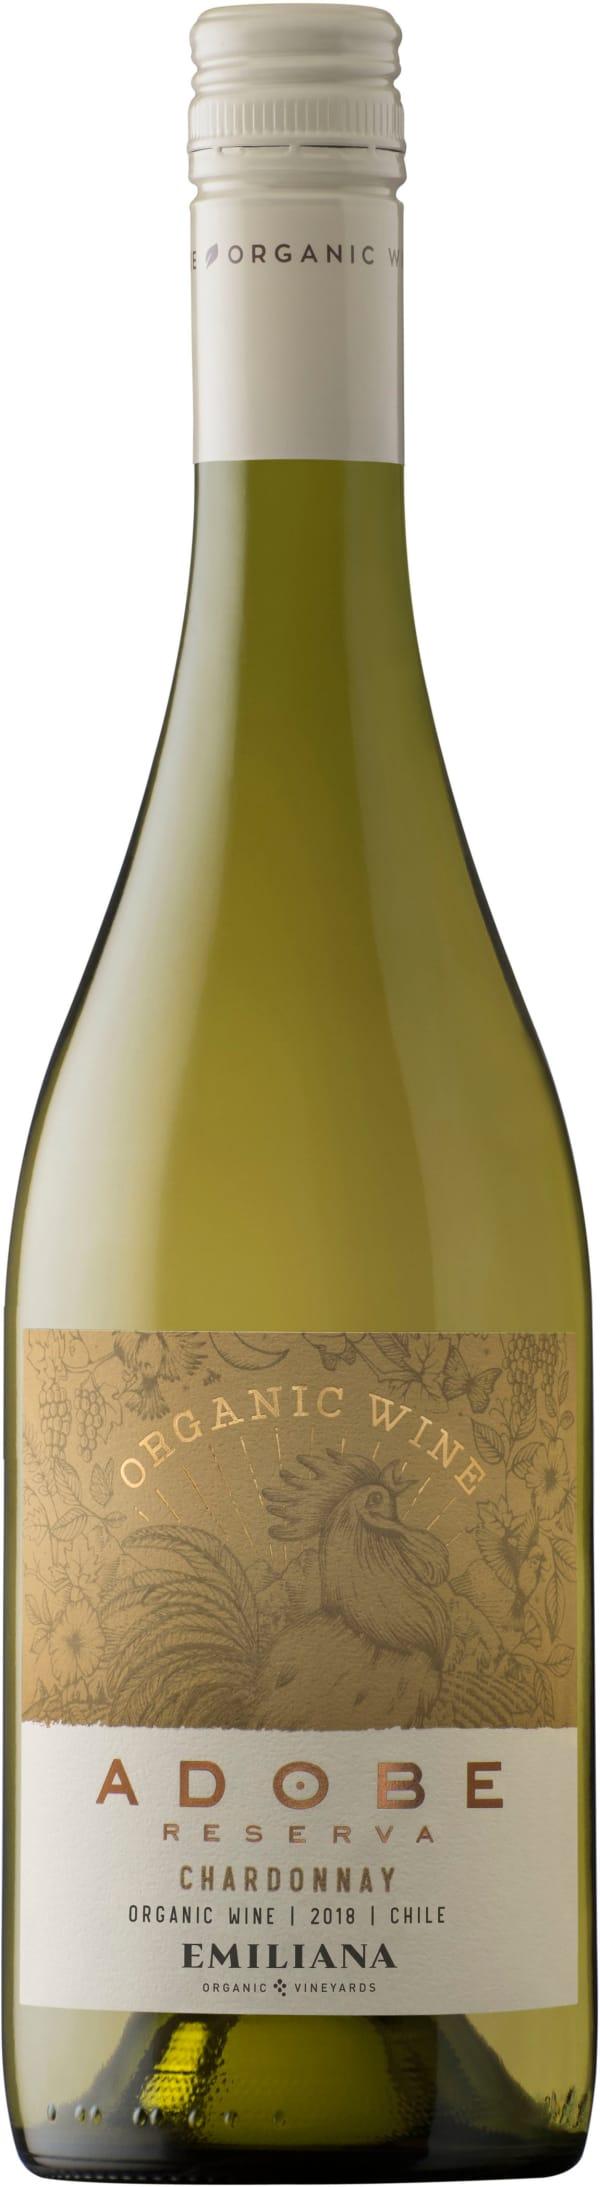 Natura Chardonnay organic 2018